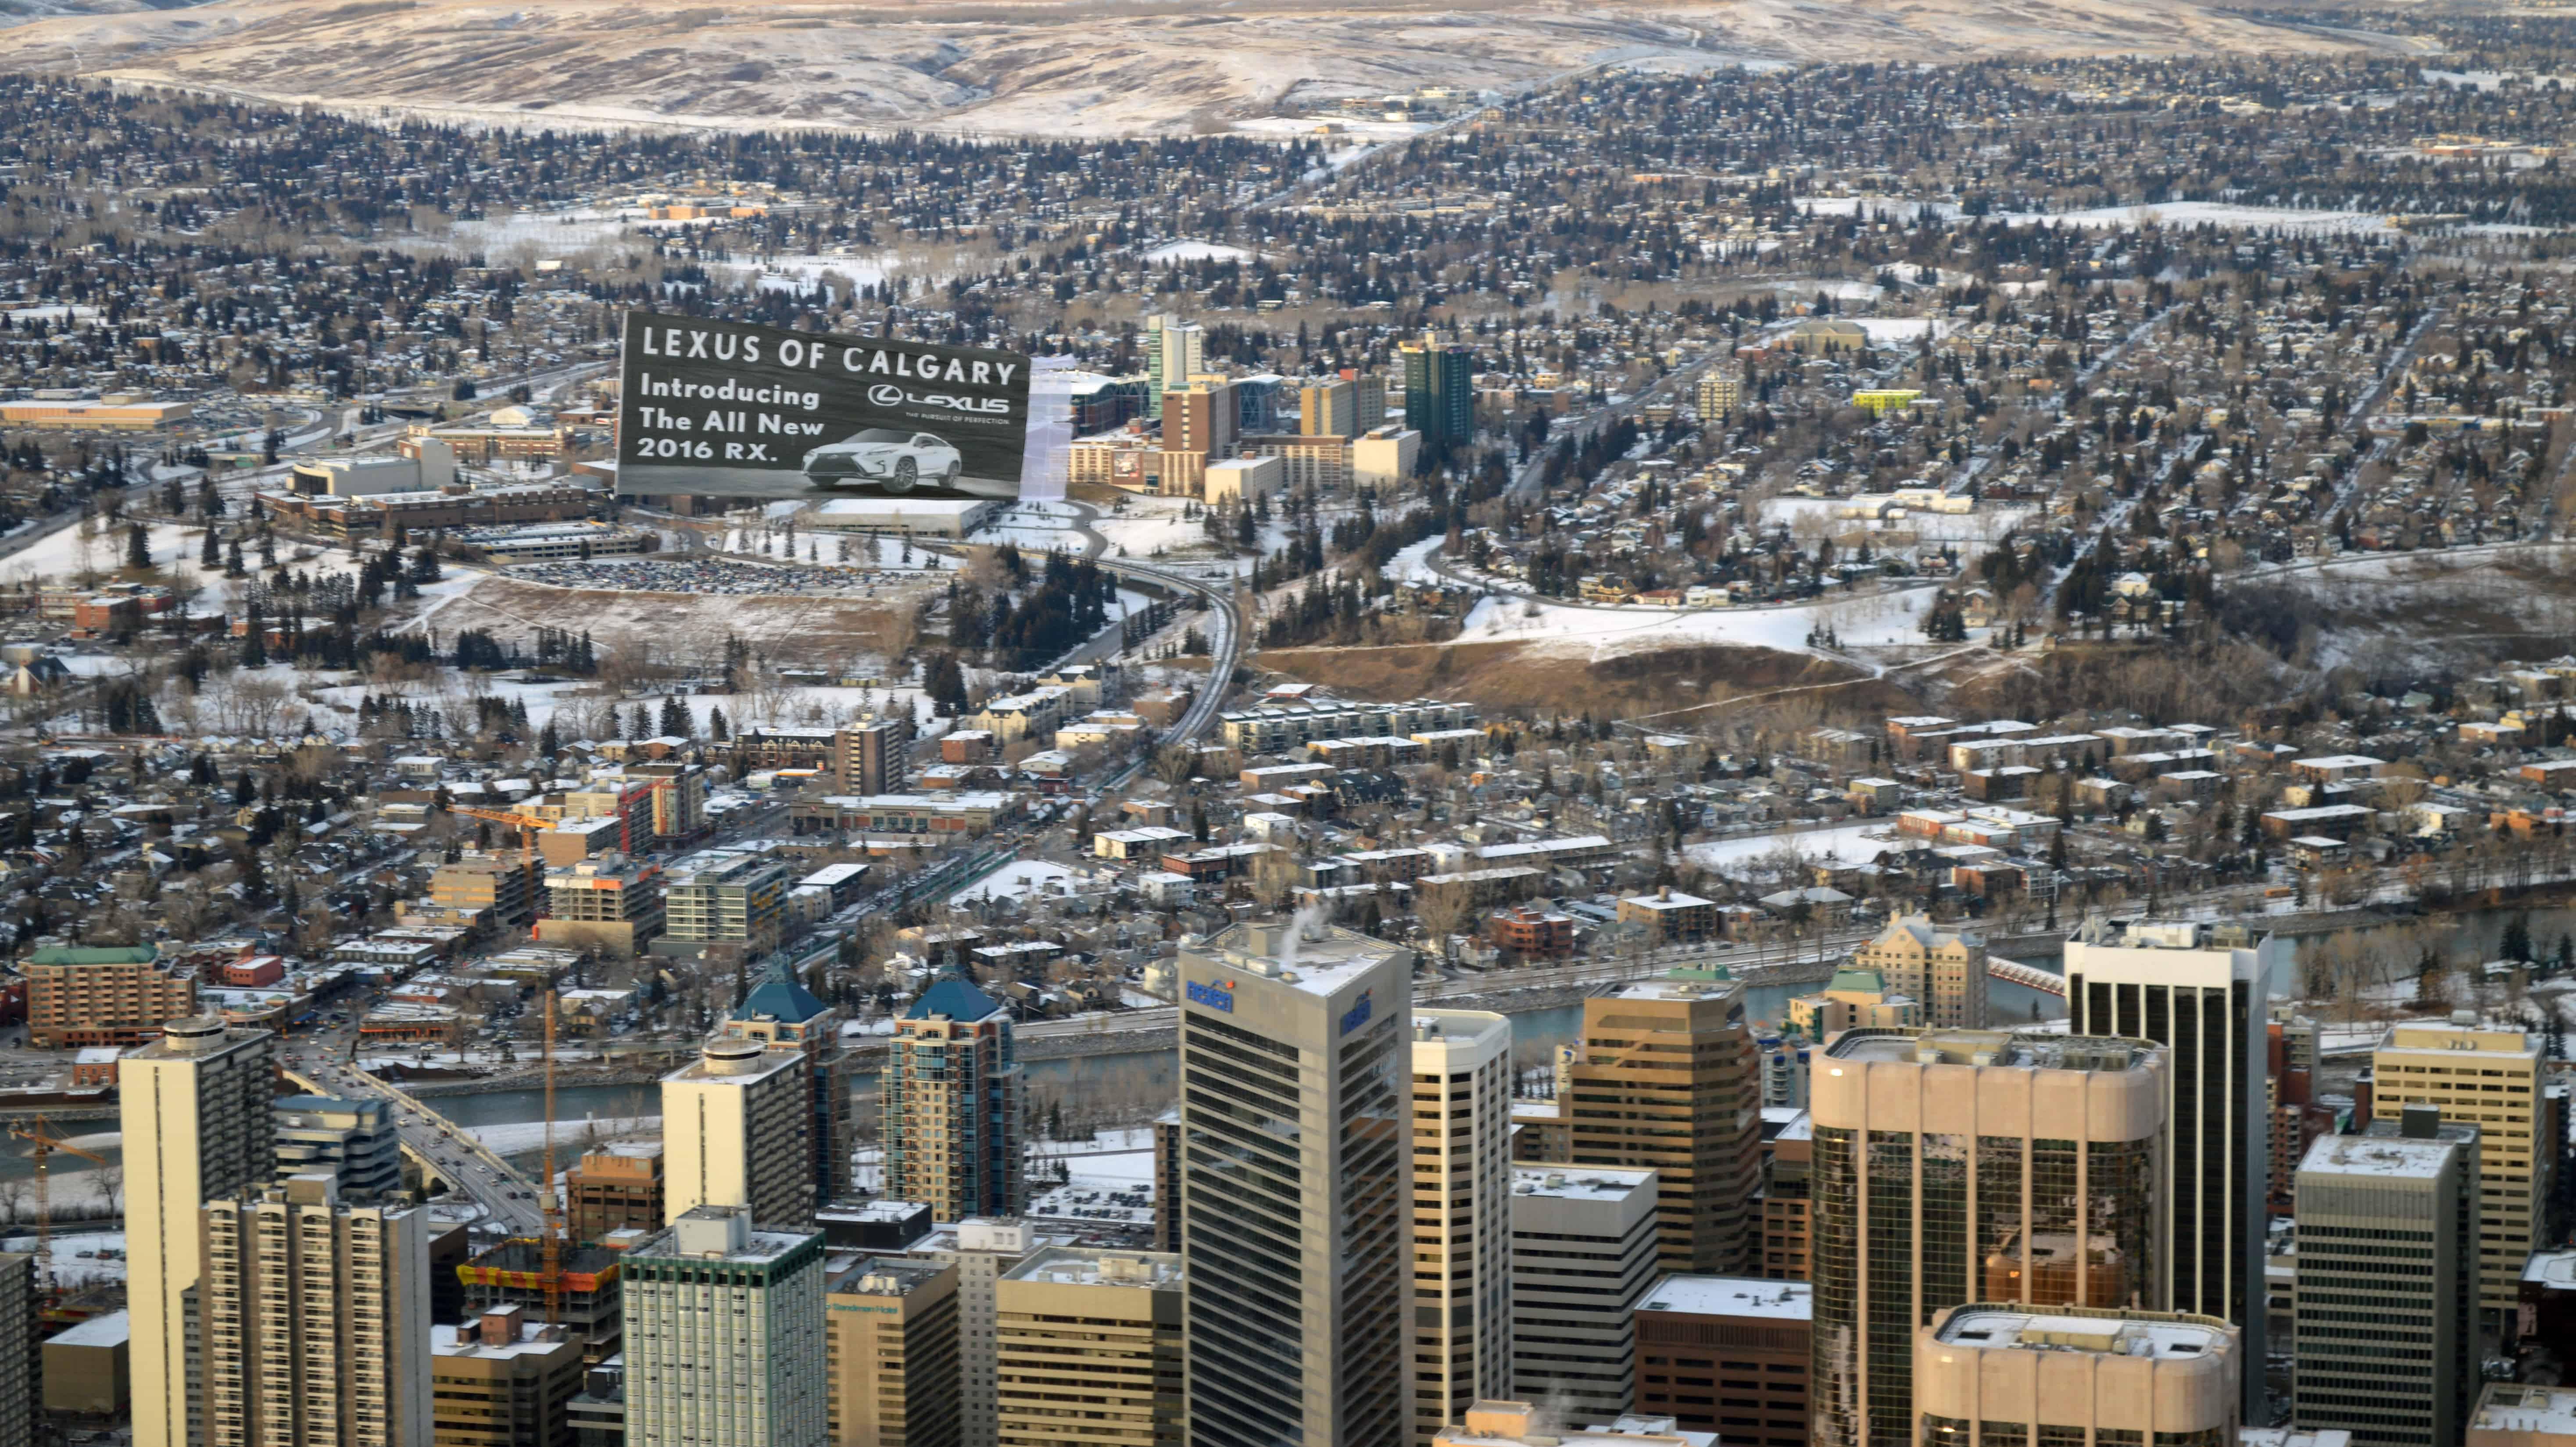 2015-11-20-Calgary-Canada-Lexus-Helicopter-Skytaculair-Banner-Job-53